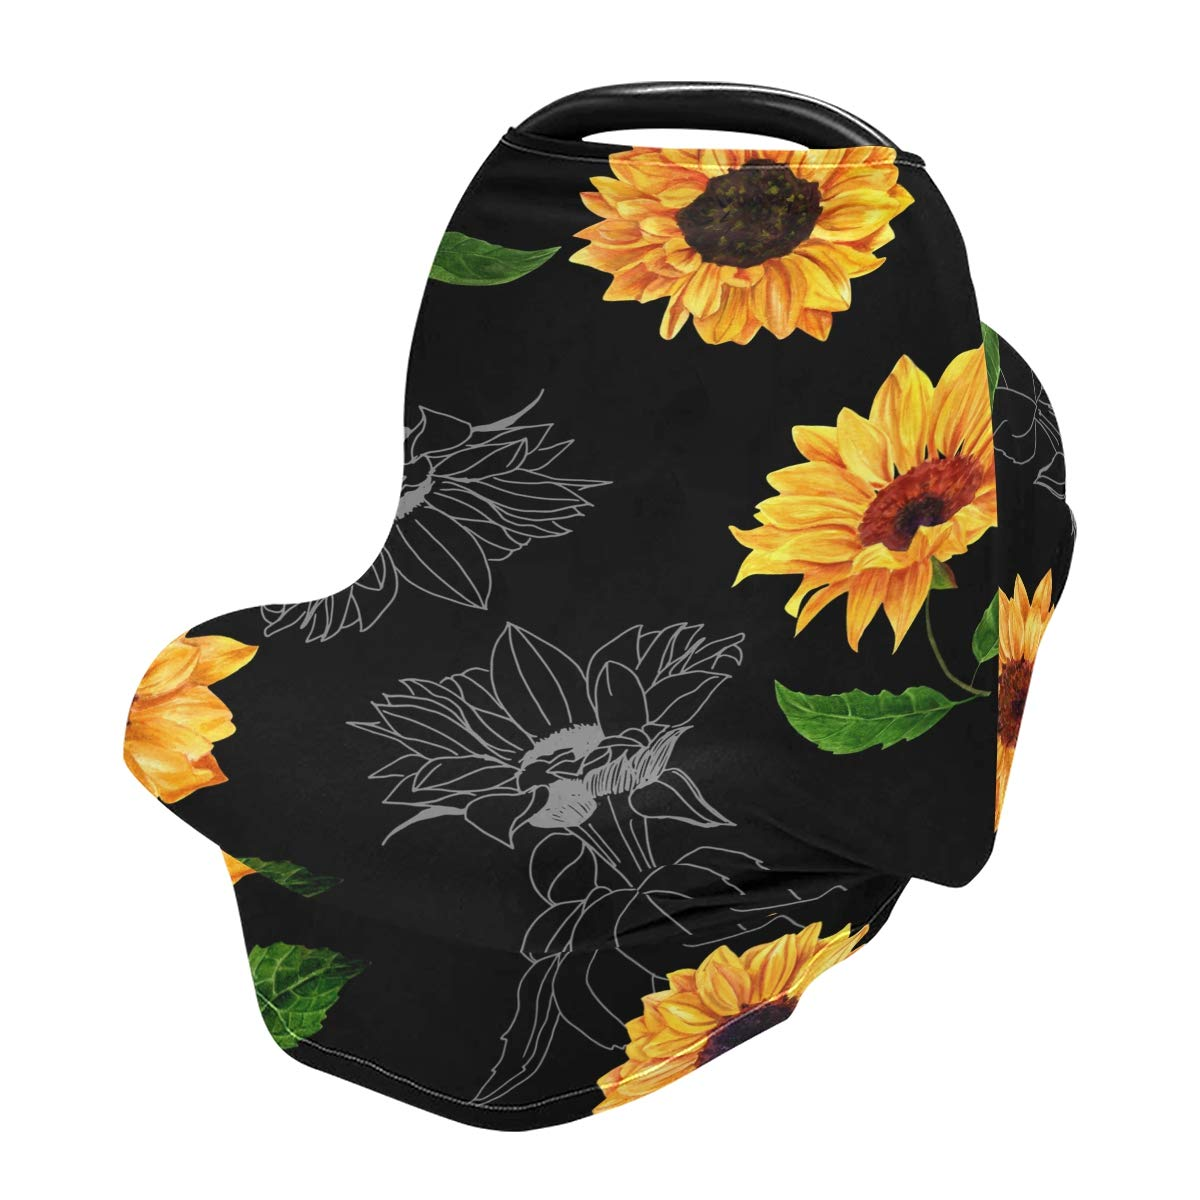 Nursing Cover Breastfeeding Memphis Mall Popular popular Scarf Black Sunflowers Background- B